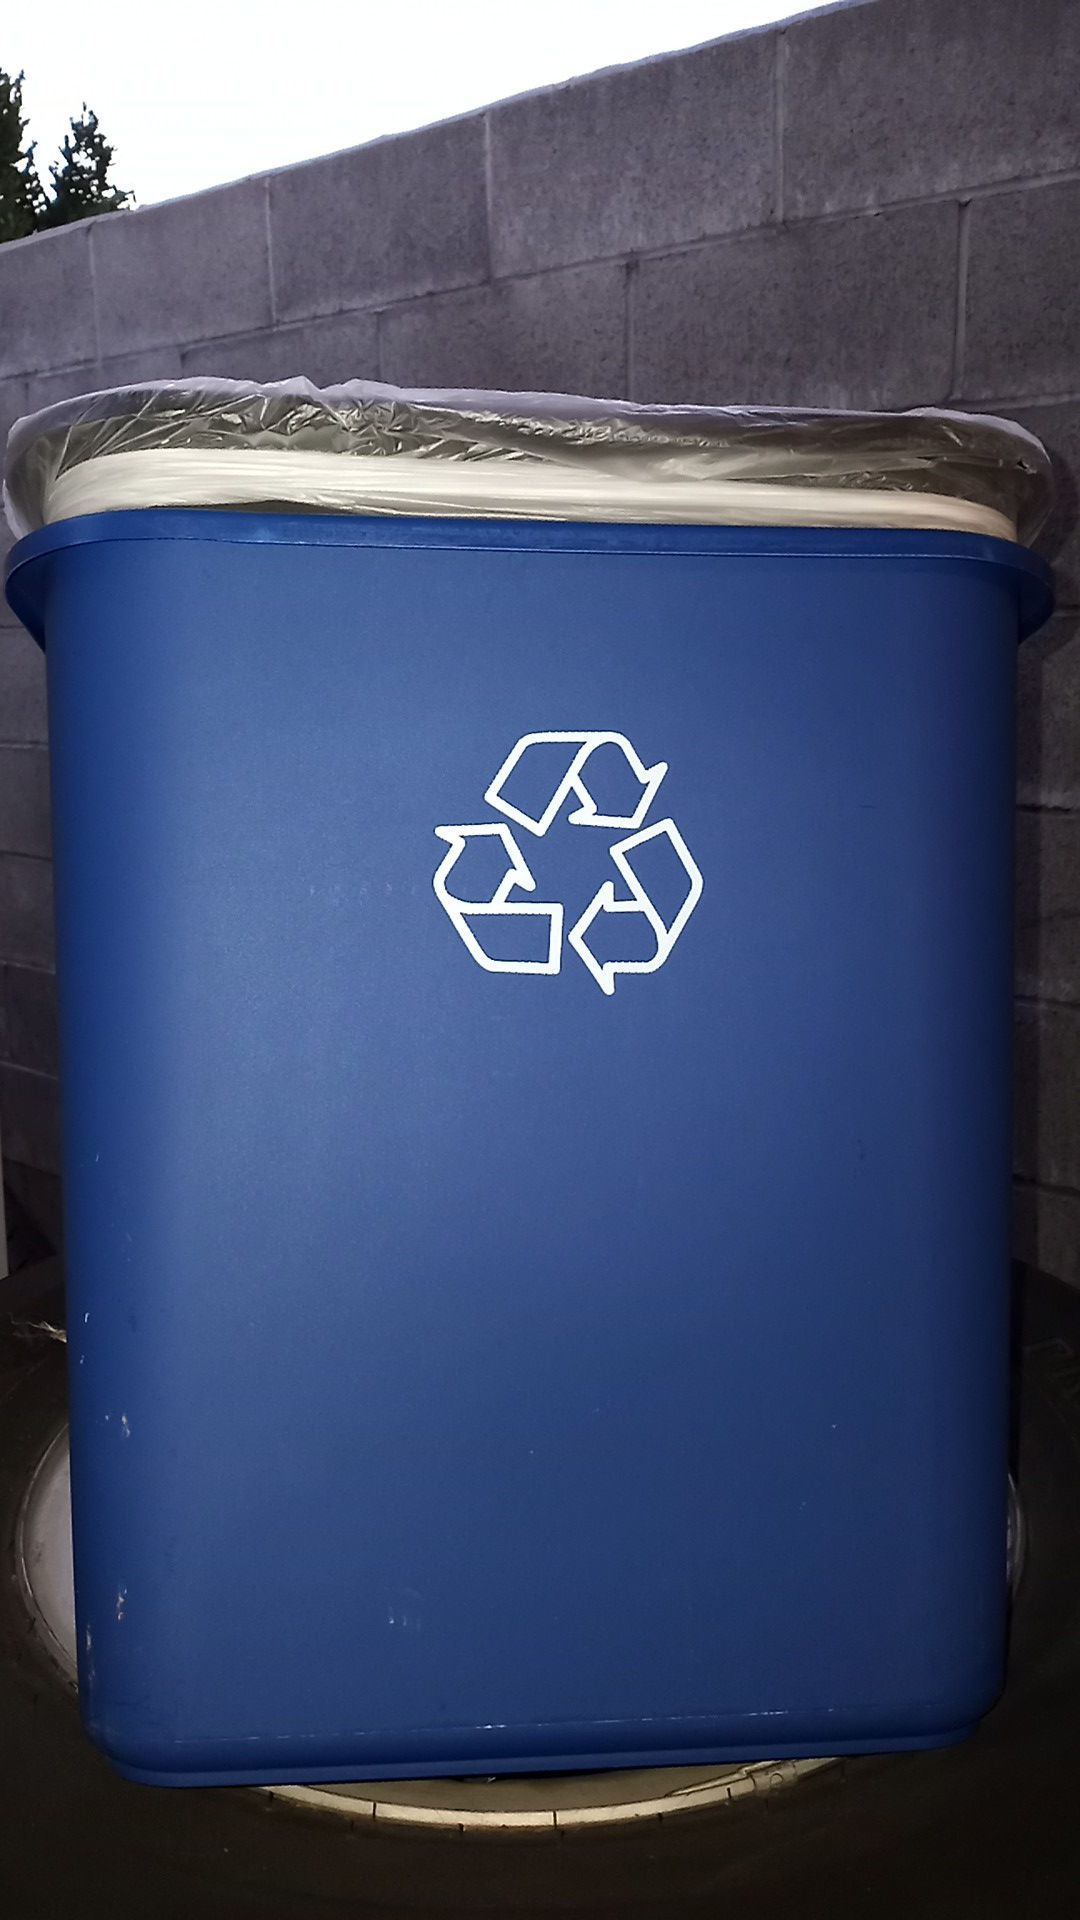 Rubbermaid trash can